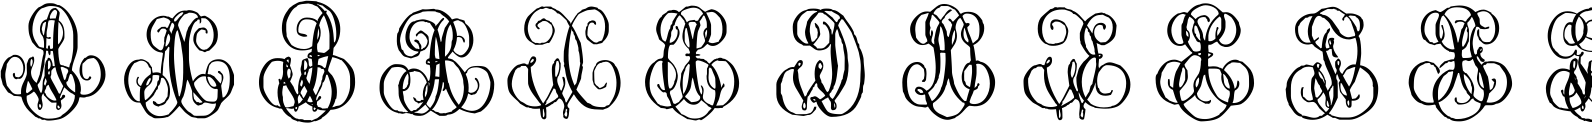 1864 GLC Monogram